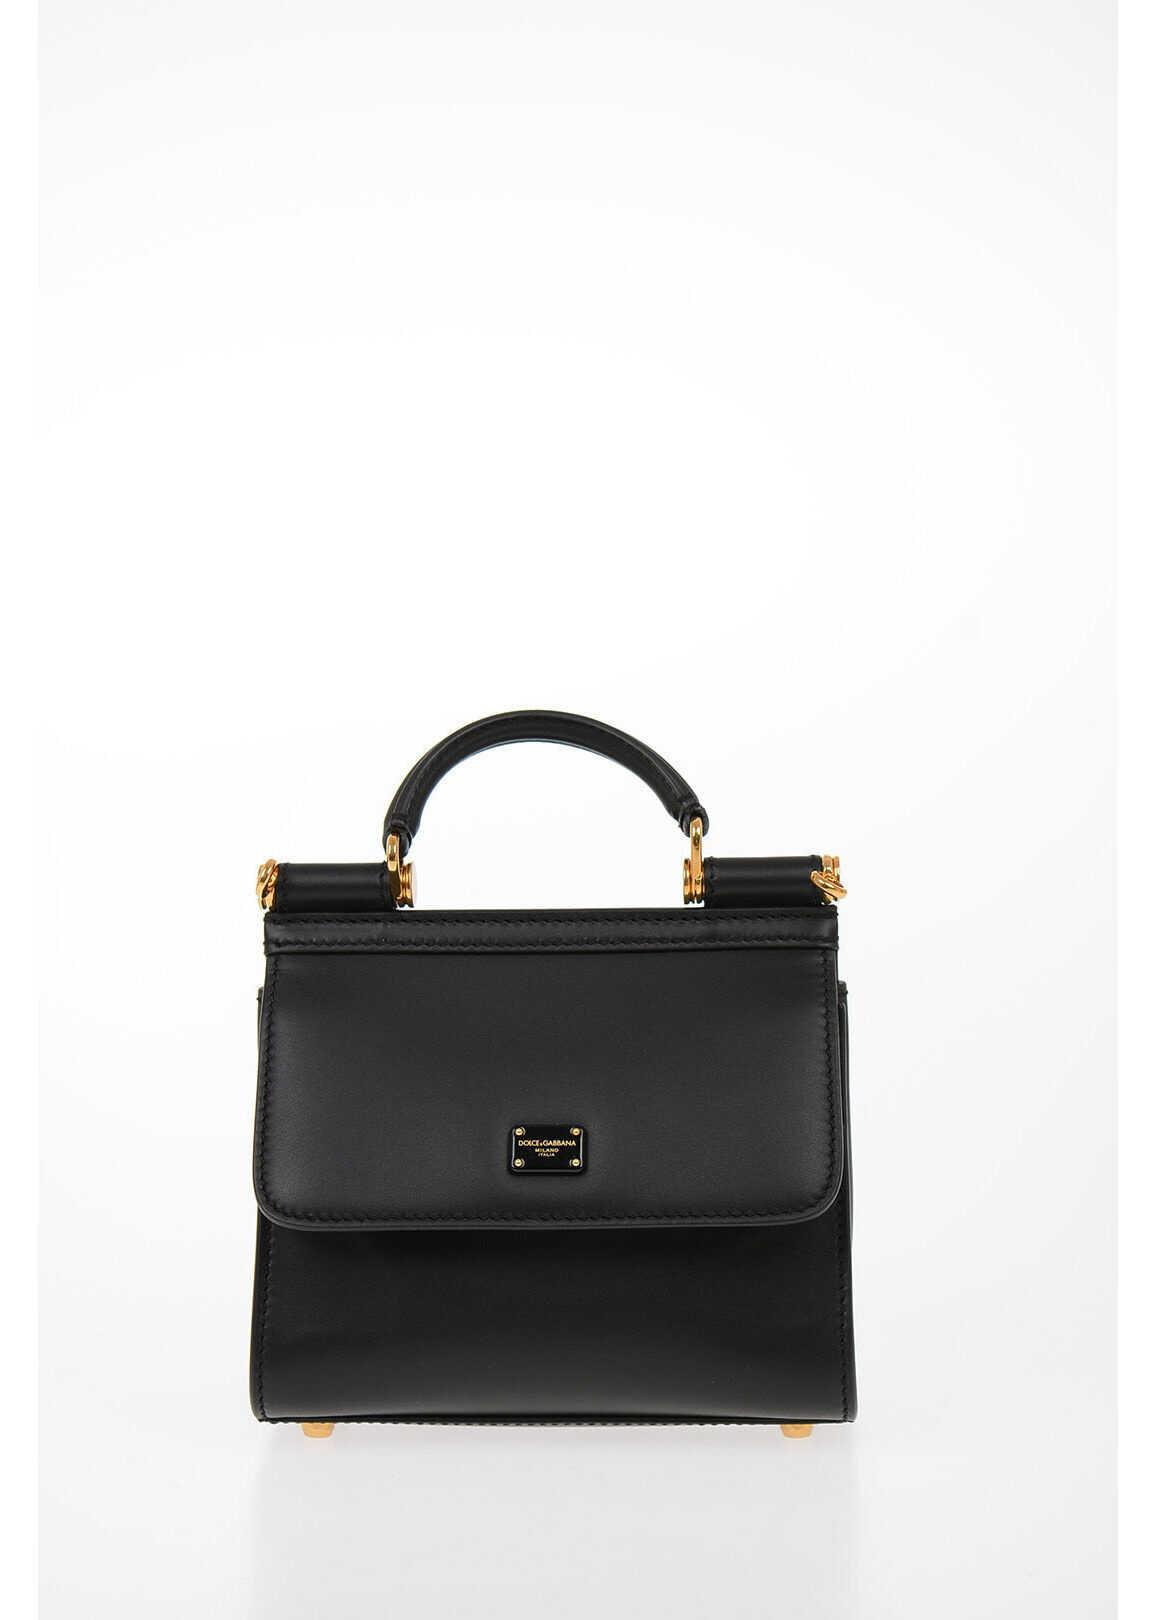 Dolce & Gabbana Leather SICILY 58 Mini Crossbody Bag BLACK imagine b-mall.ro